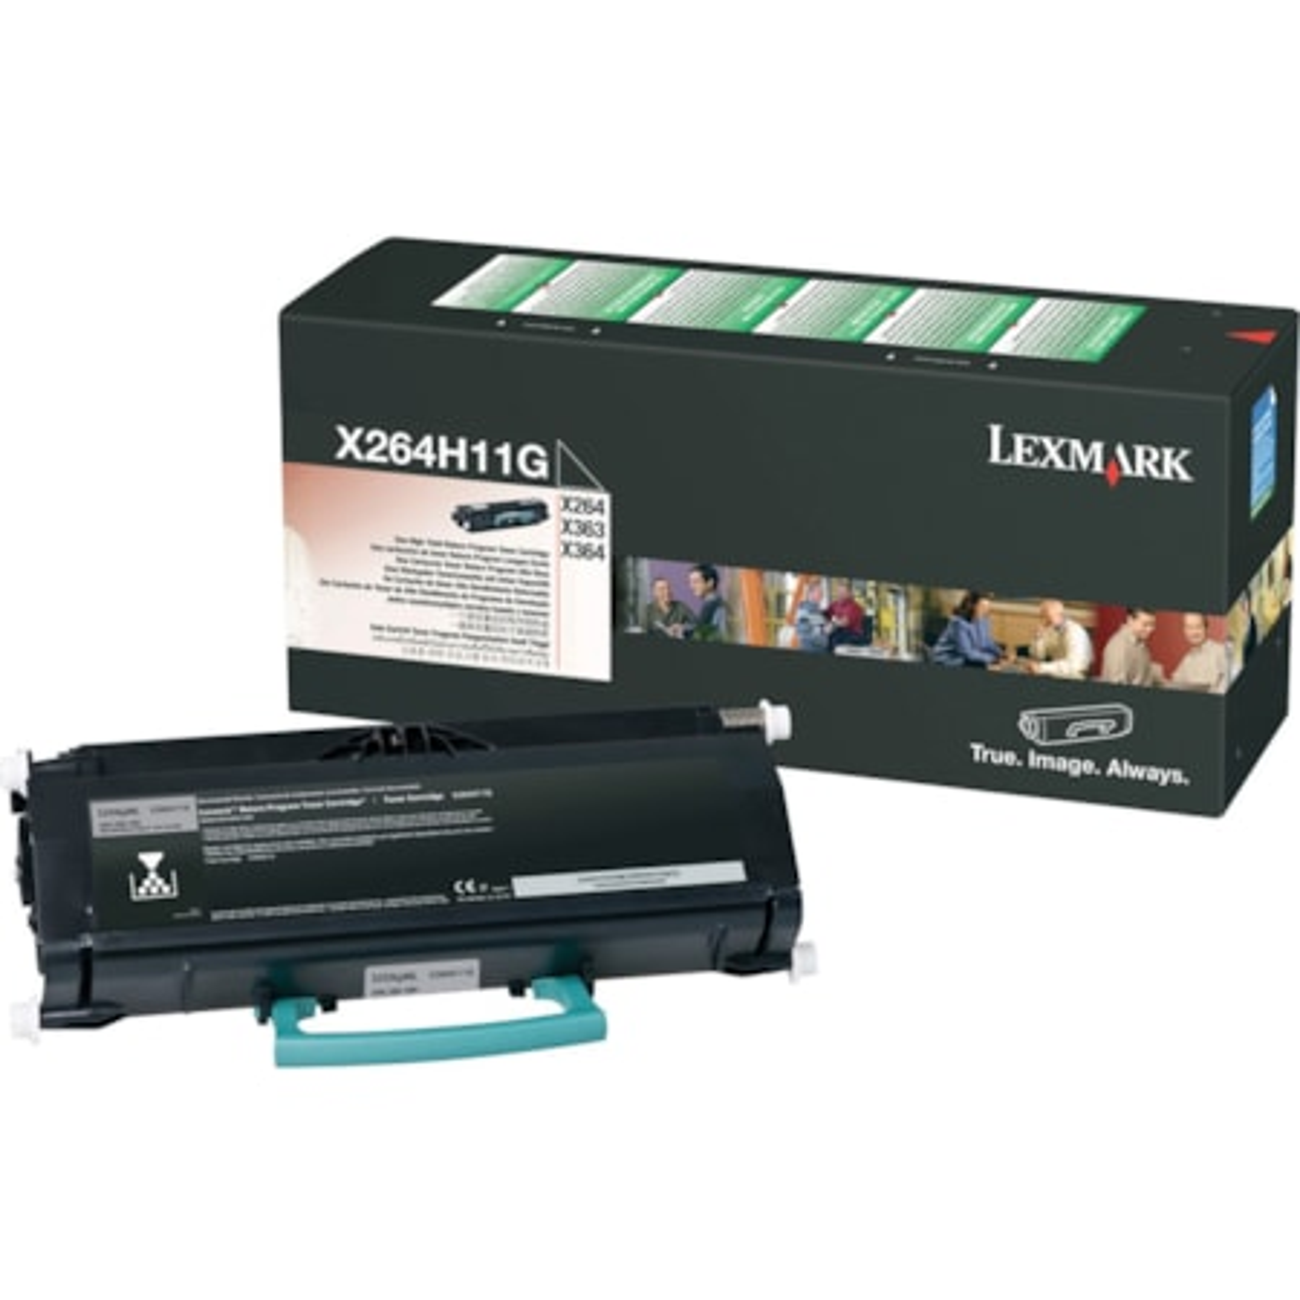 Lexmark X264H11G Toner Cartridge - Black